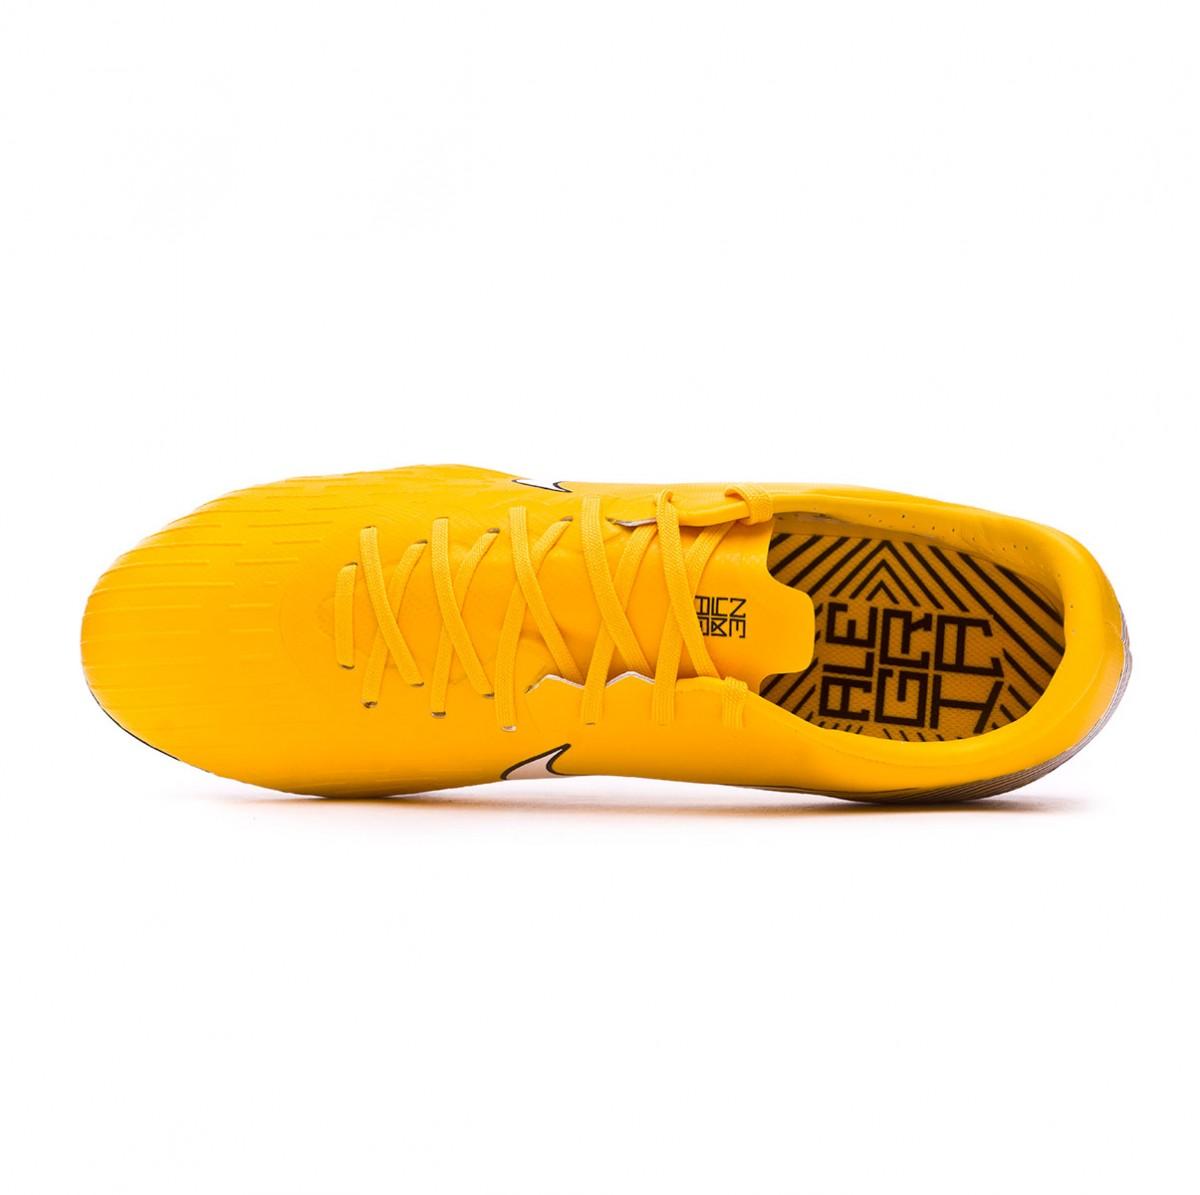 dac72dac4 Football Boots Nike Mercurial Vapor XII Pro AG-Pro Neymar Yellow-Black - Football  store Fútbol Emotion